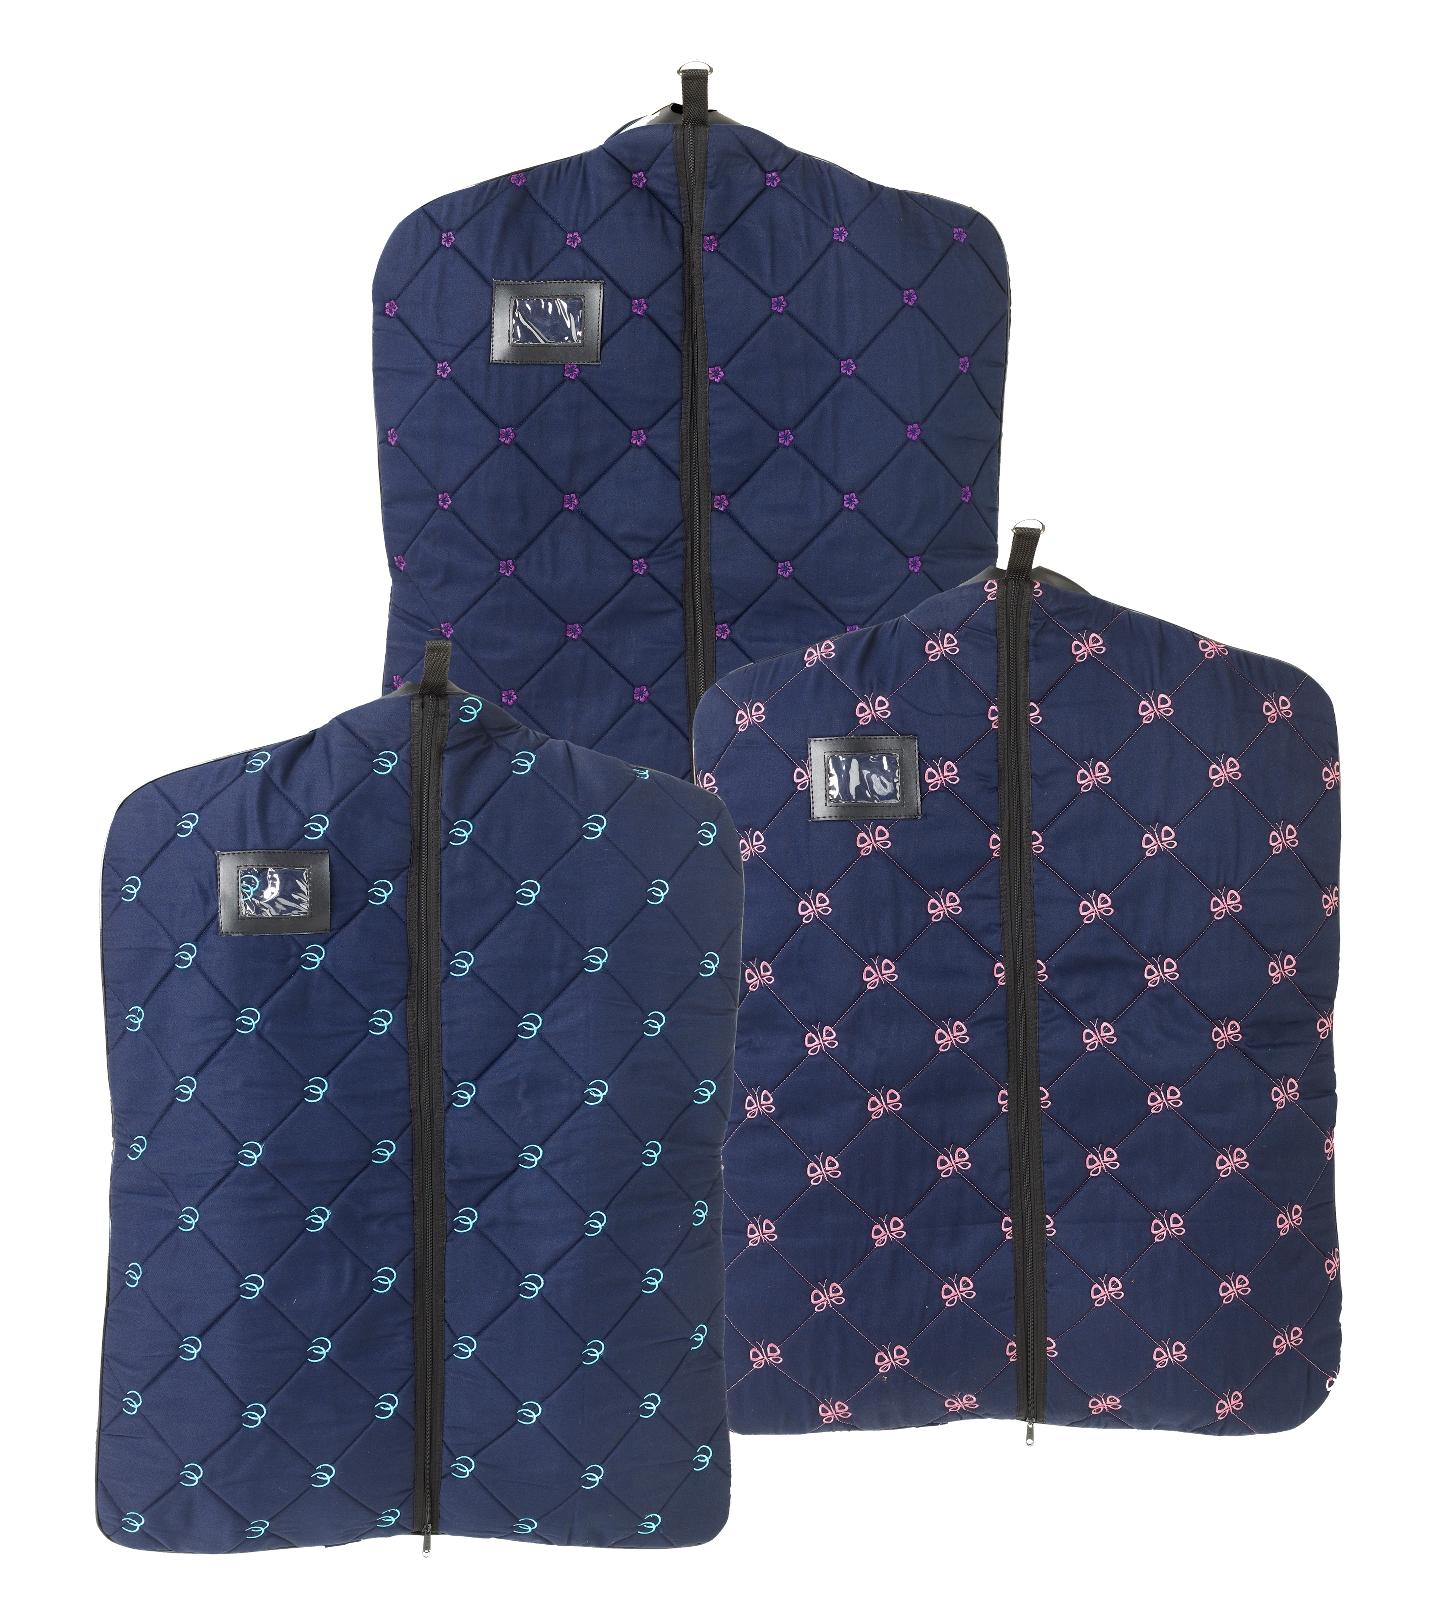 Centaur Embroidered Garment Bag